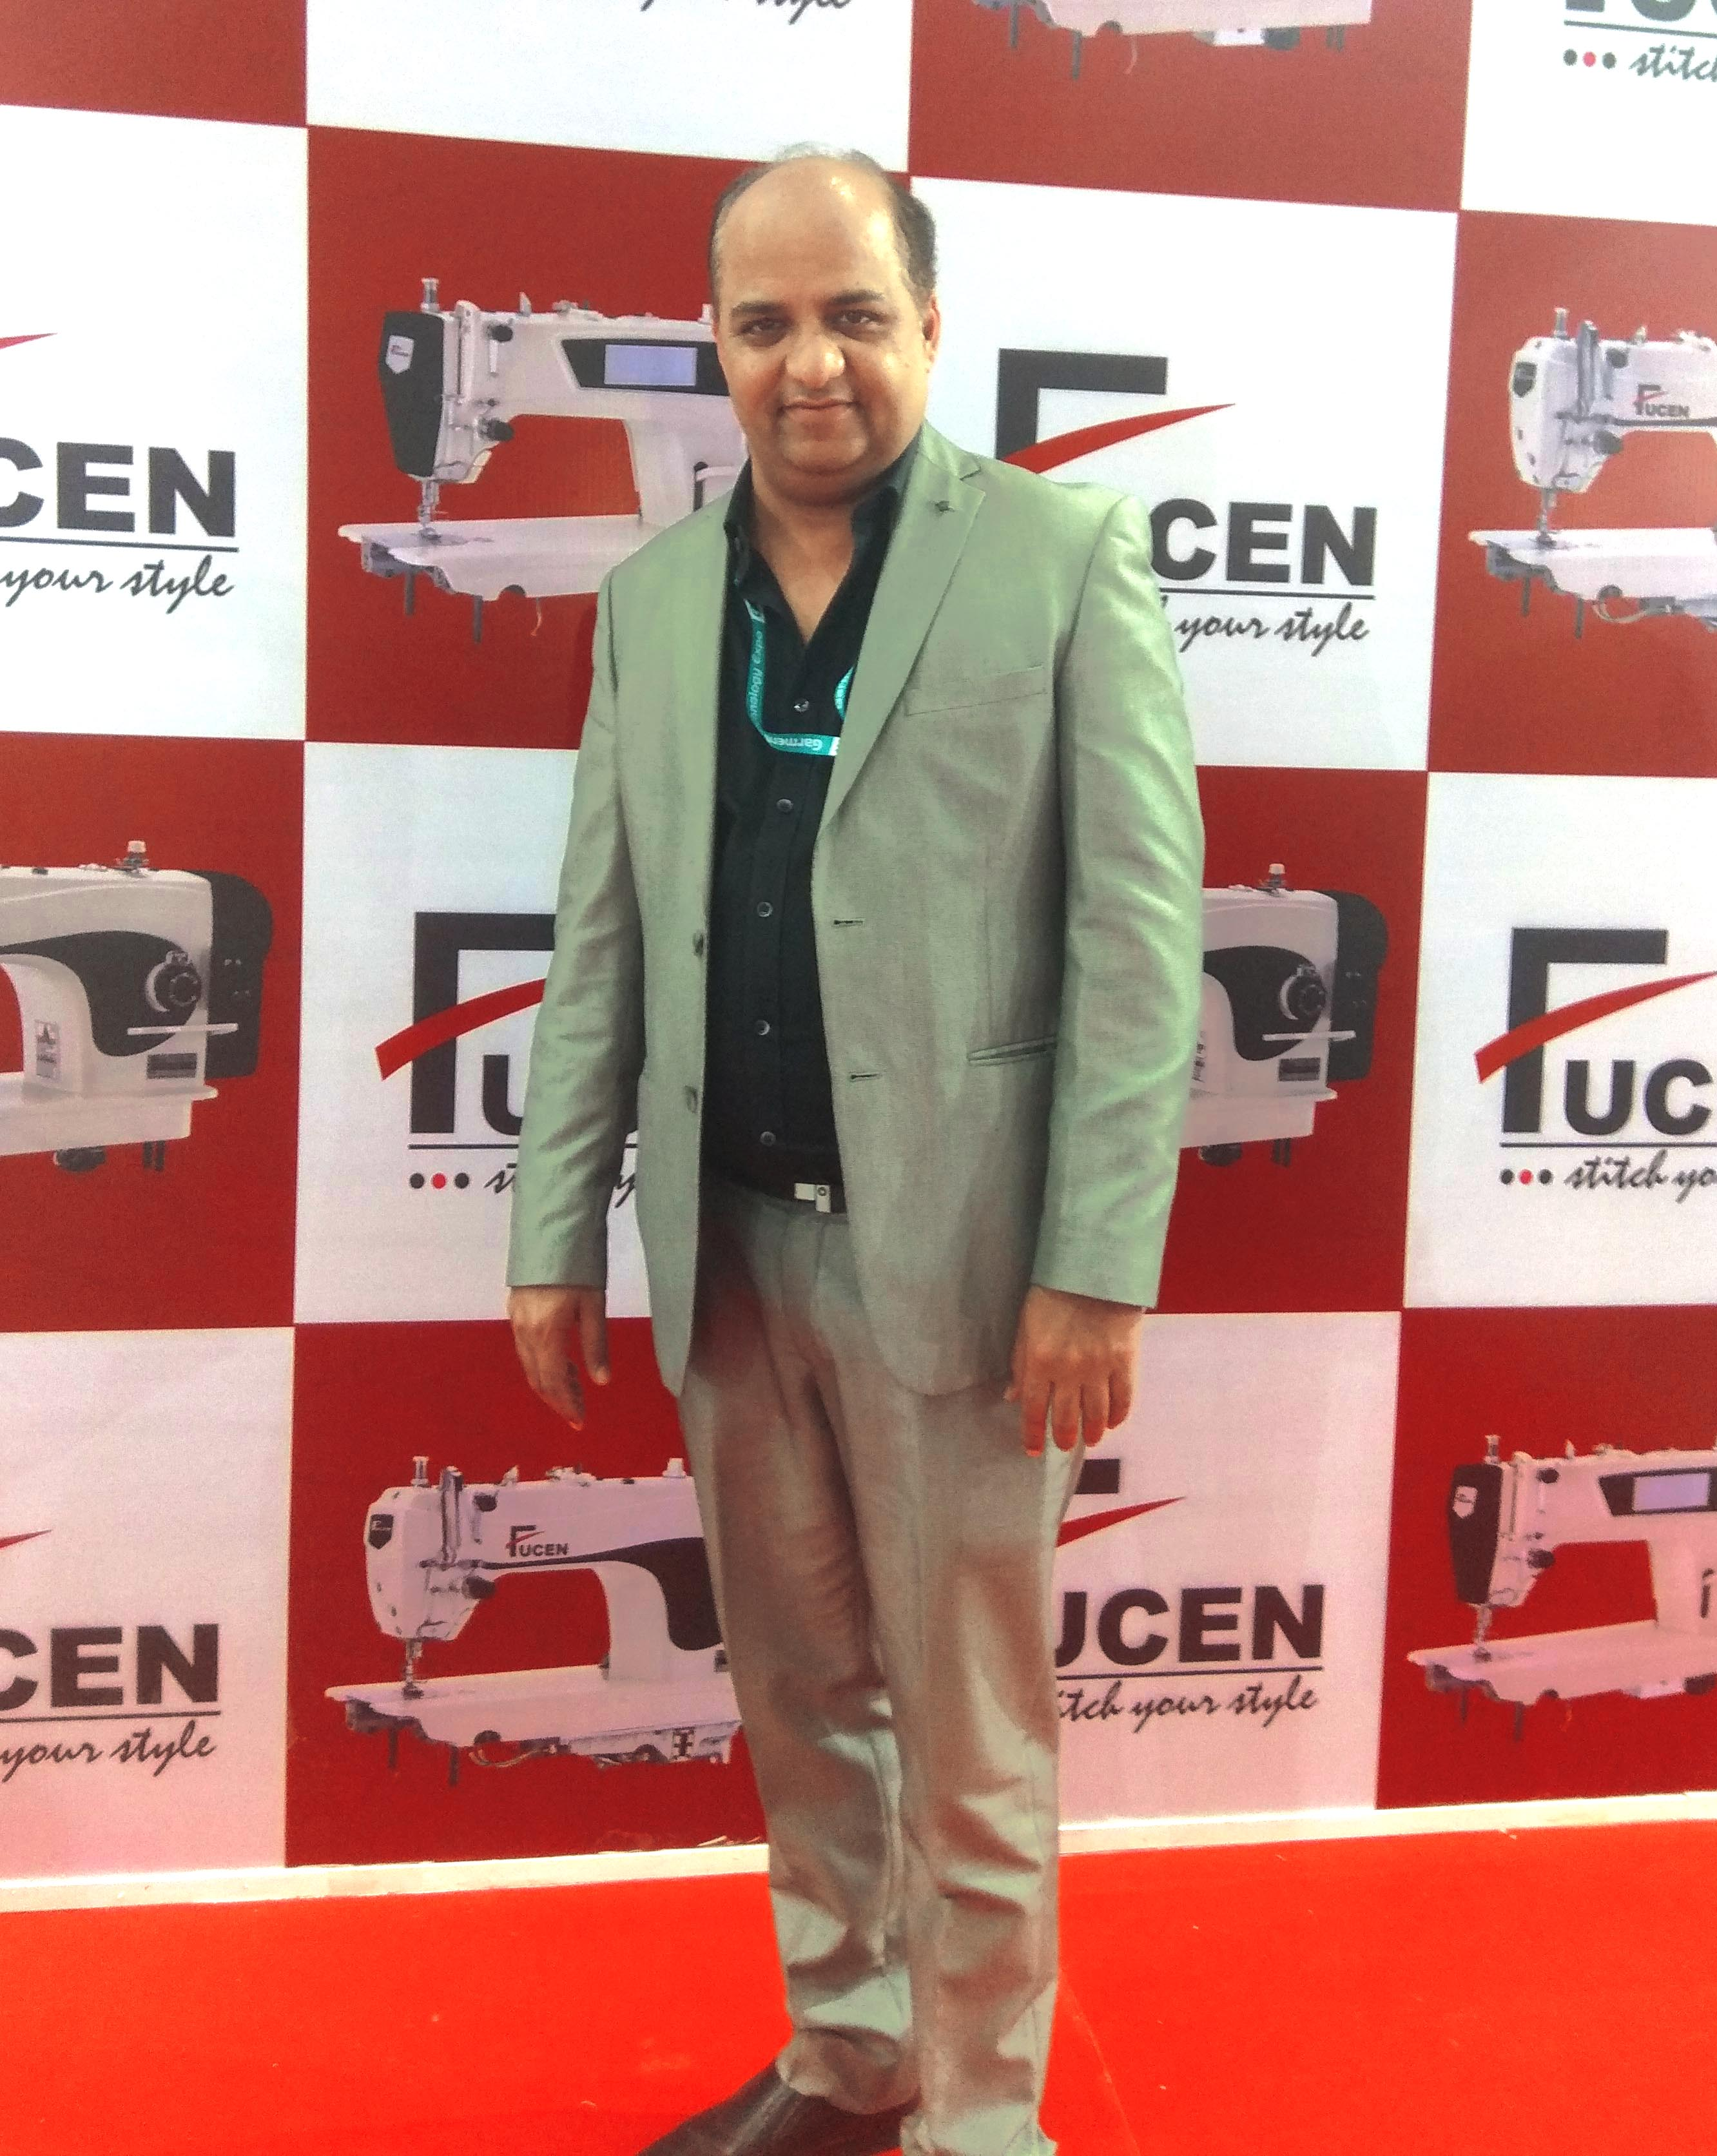 t Narang, Director, STI Apparel Automation Pvt. Ltd. (India Business Partner of Fucen)